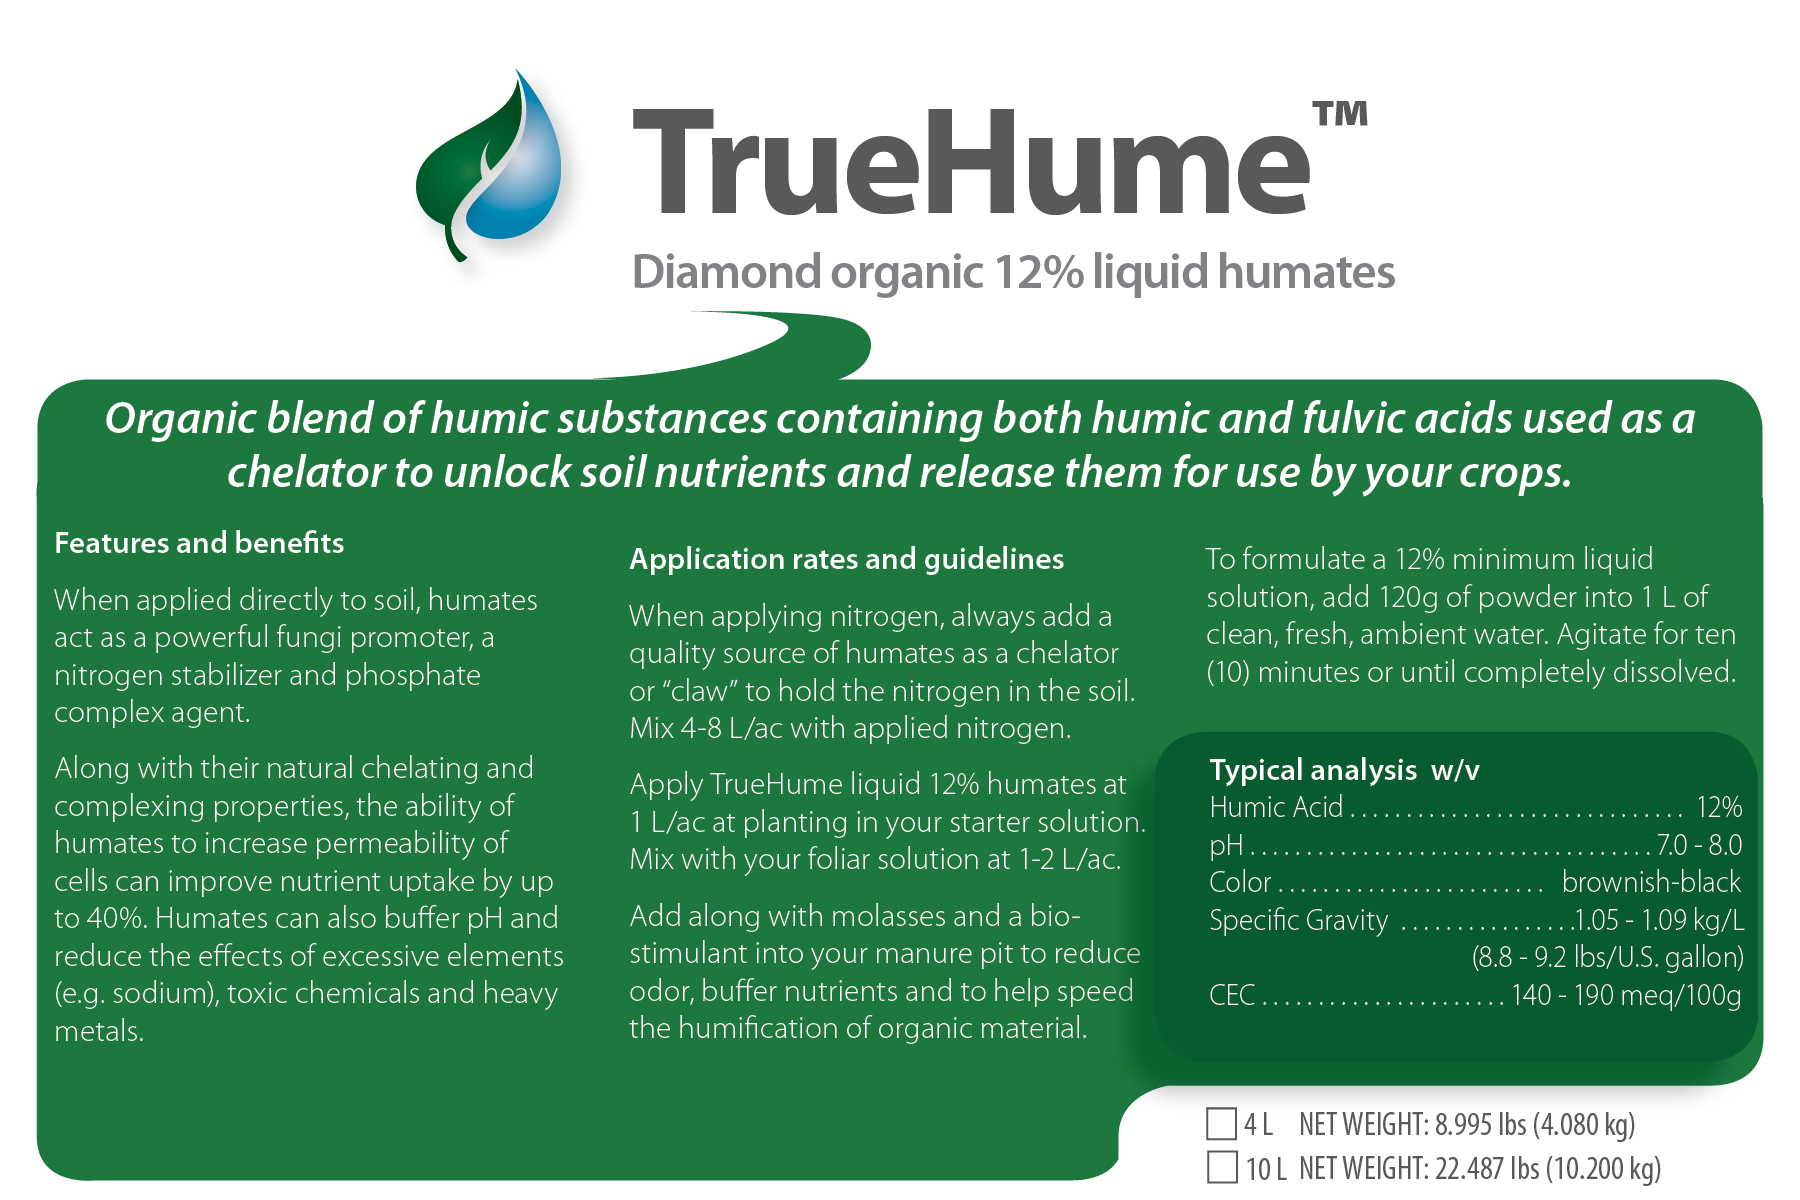 TrueHume Diamond 12% Organic Liquid Humates